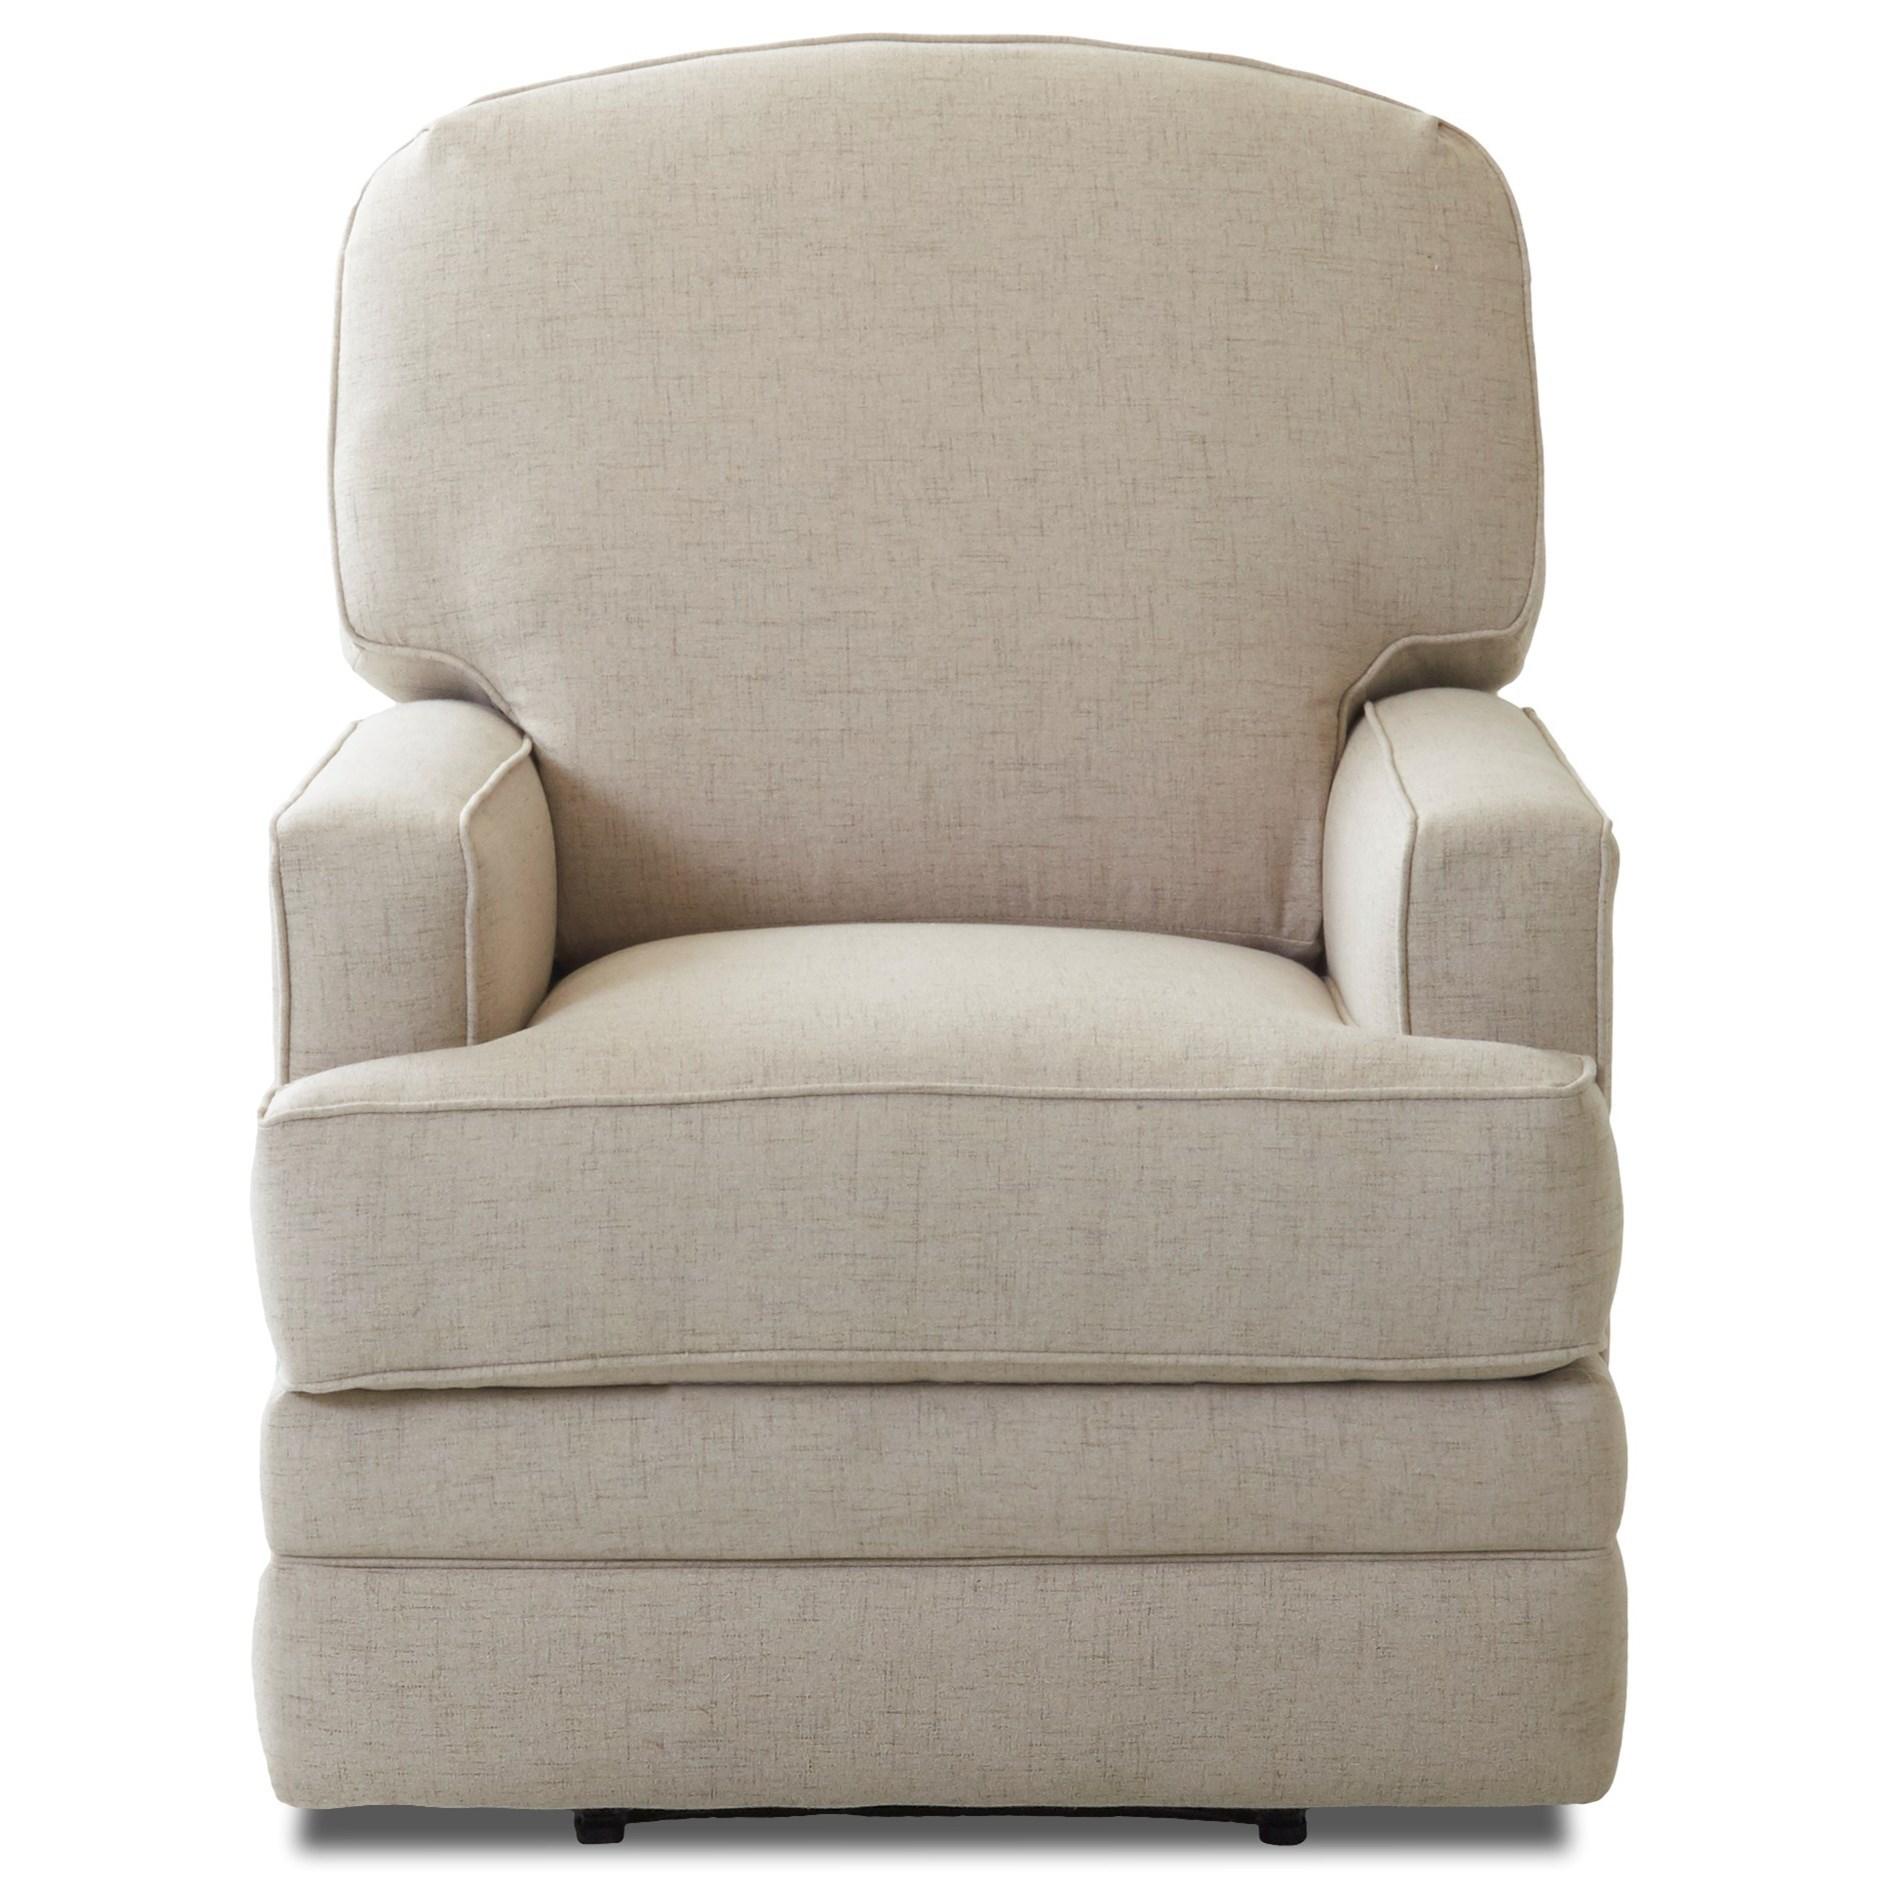 swivel rocking recliner chair mesh lounge klaussner chapman casual reclining